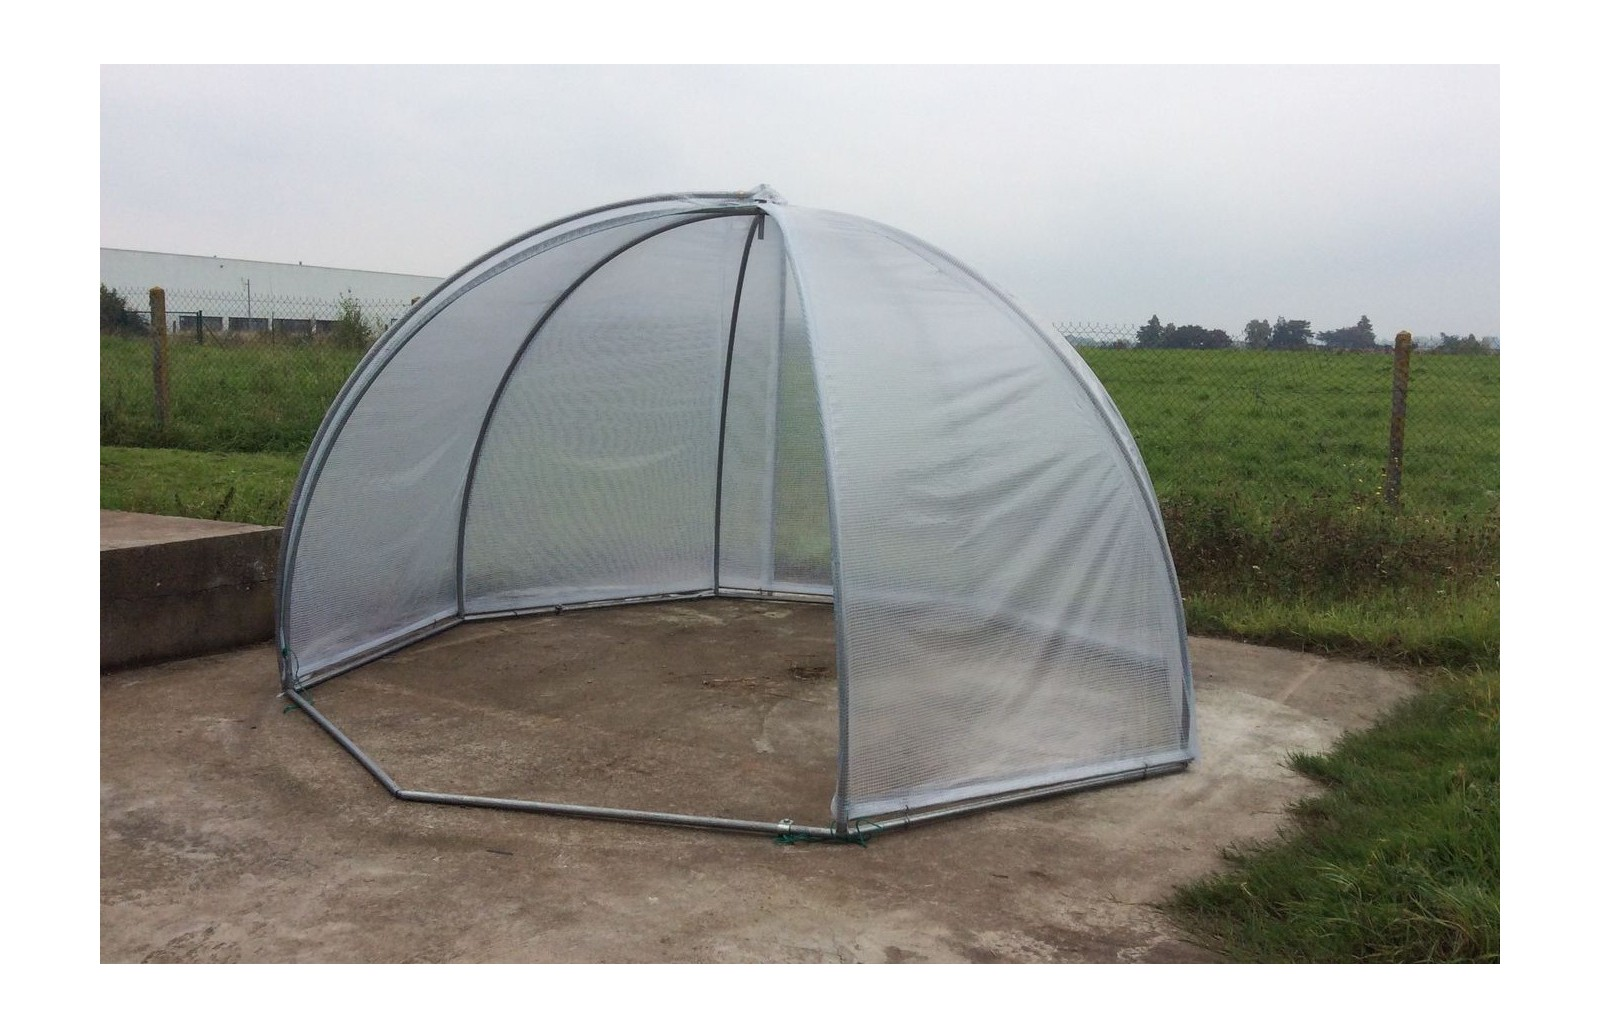 Serre igloo serres tonneau - Abri de jardin igloo tourcoing ...